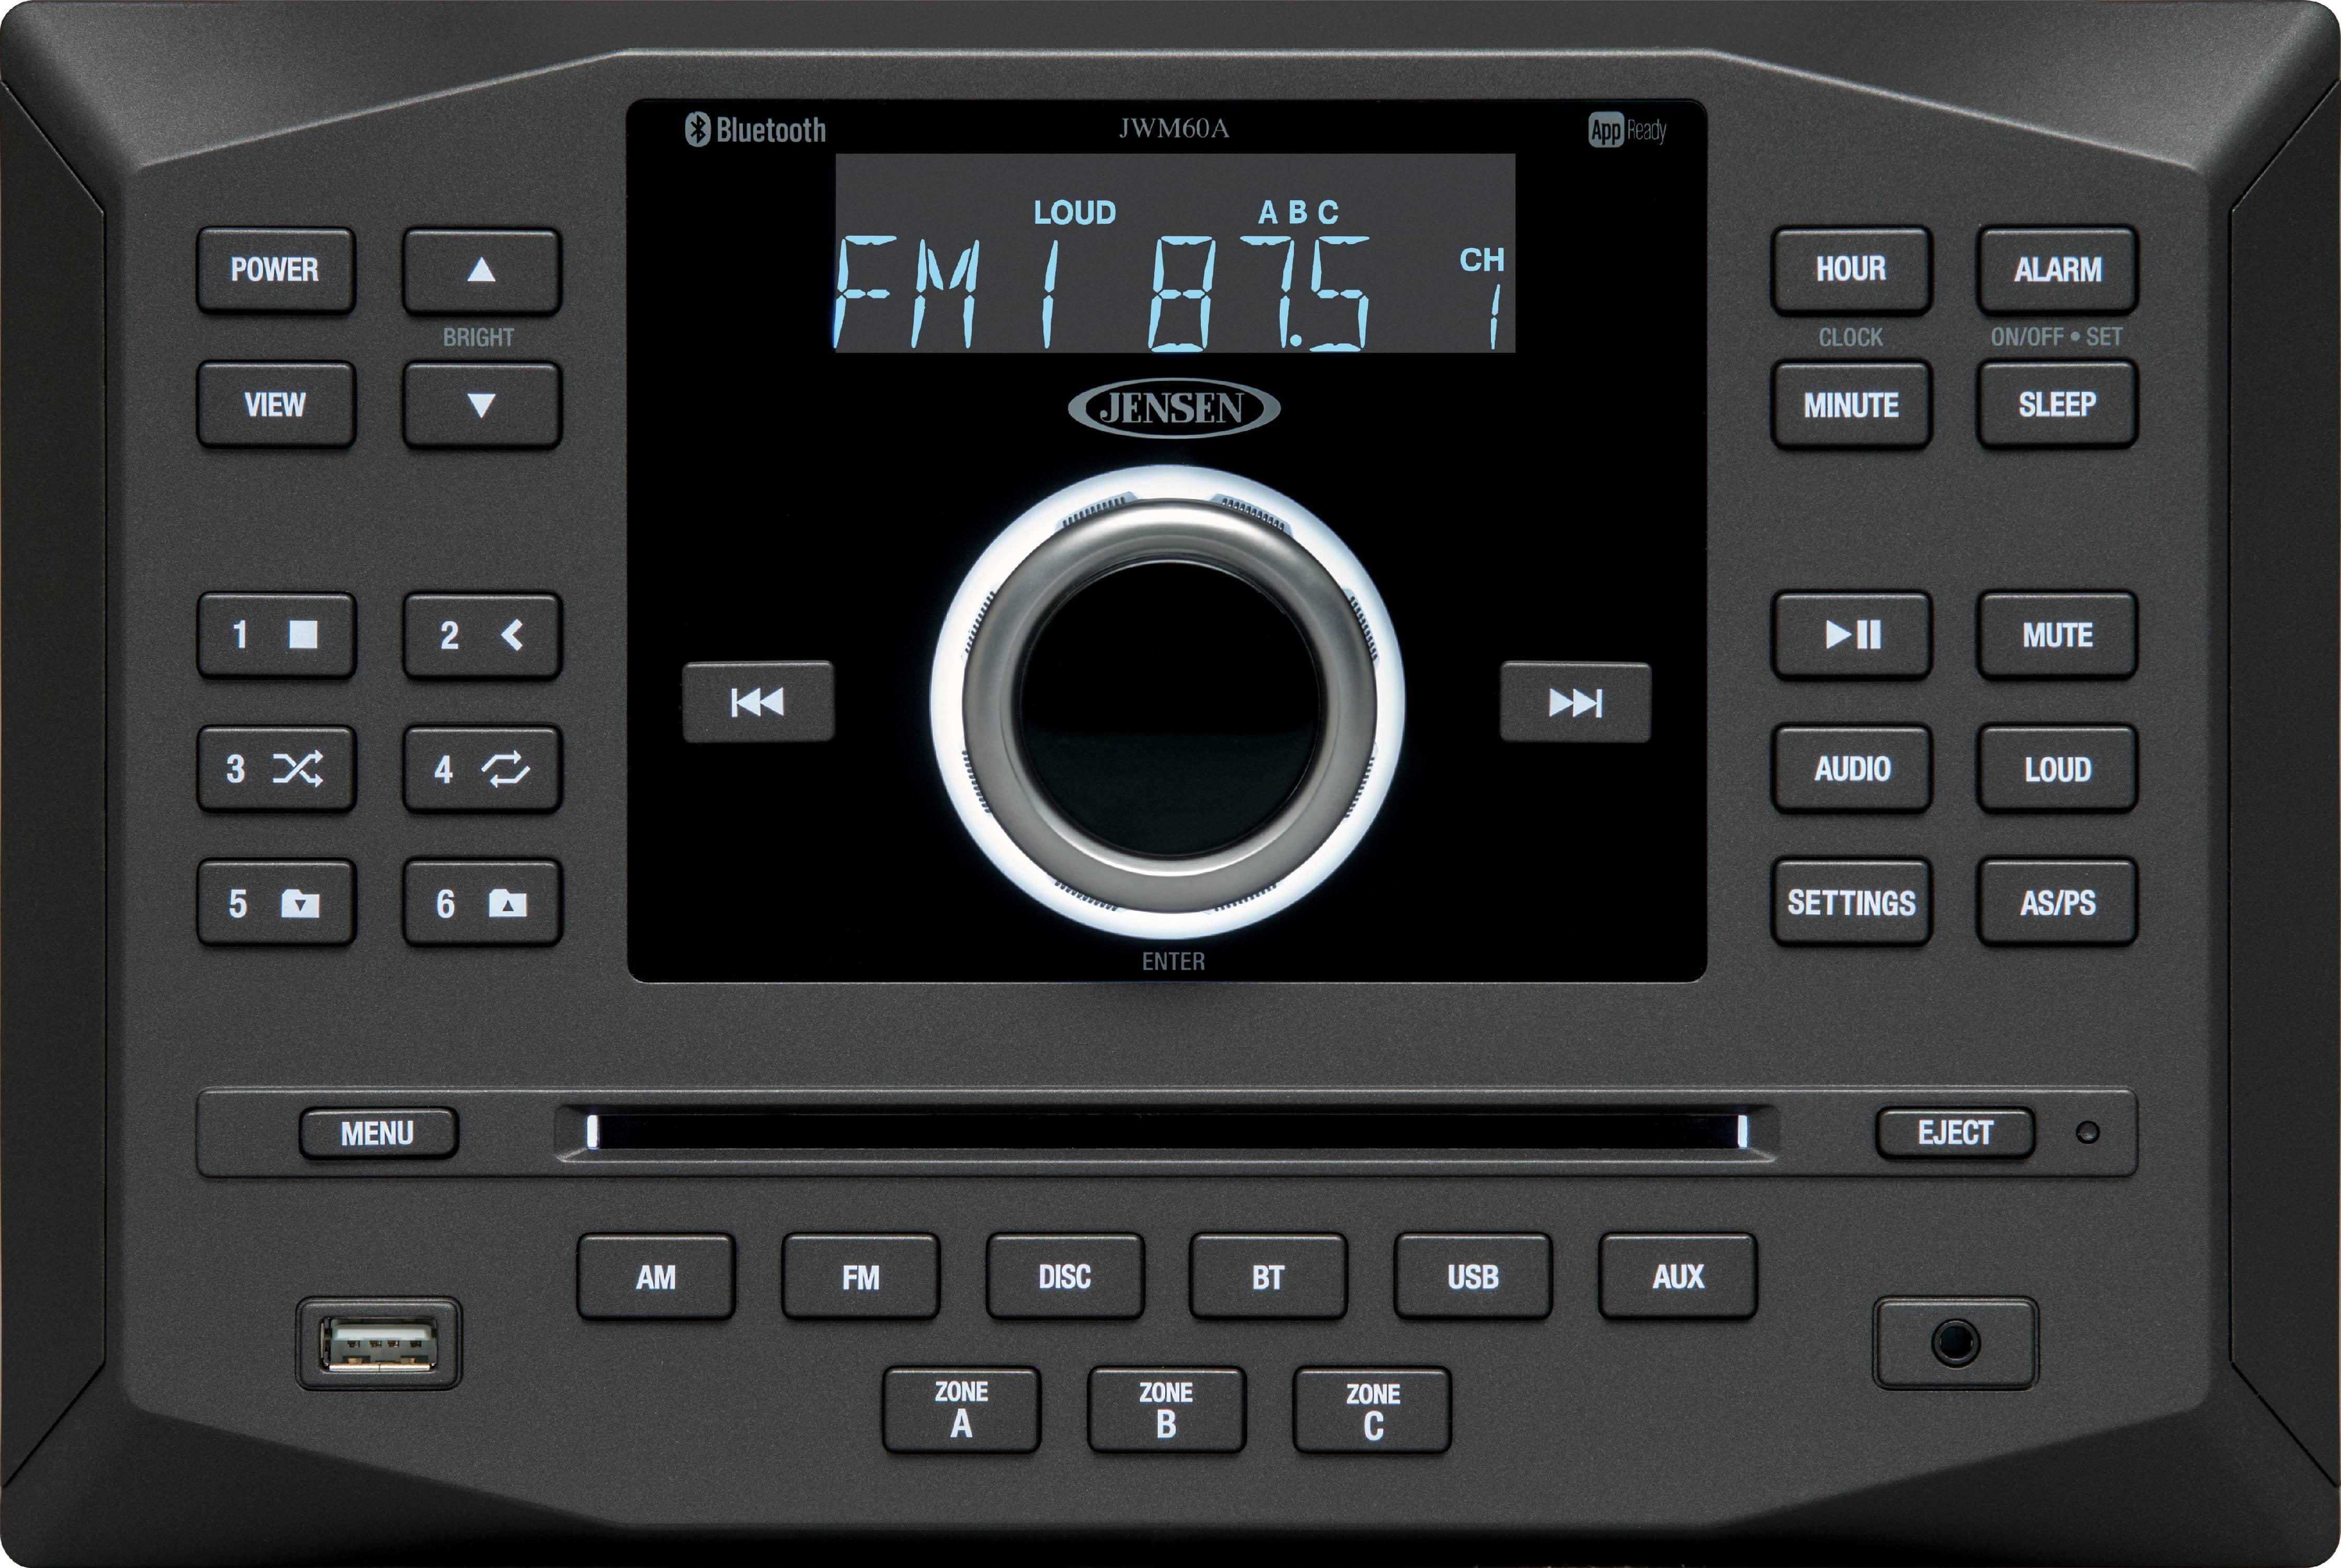 Jensen JWM60A AM|FM|DVD|CD|USB|AUX|RCA|App Ready Bluetooth Wallmount Stereo with App Control, Plays: CD, CD-R,... by Asa